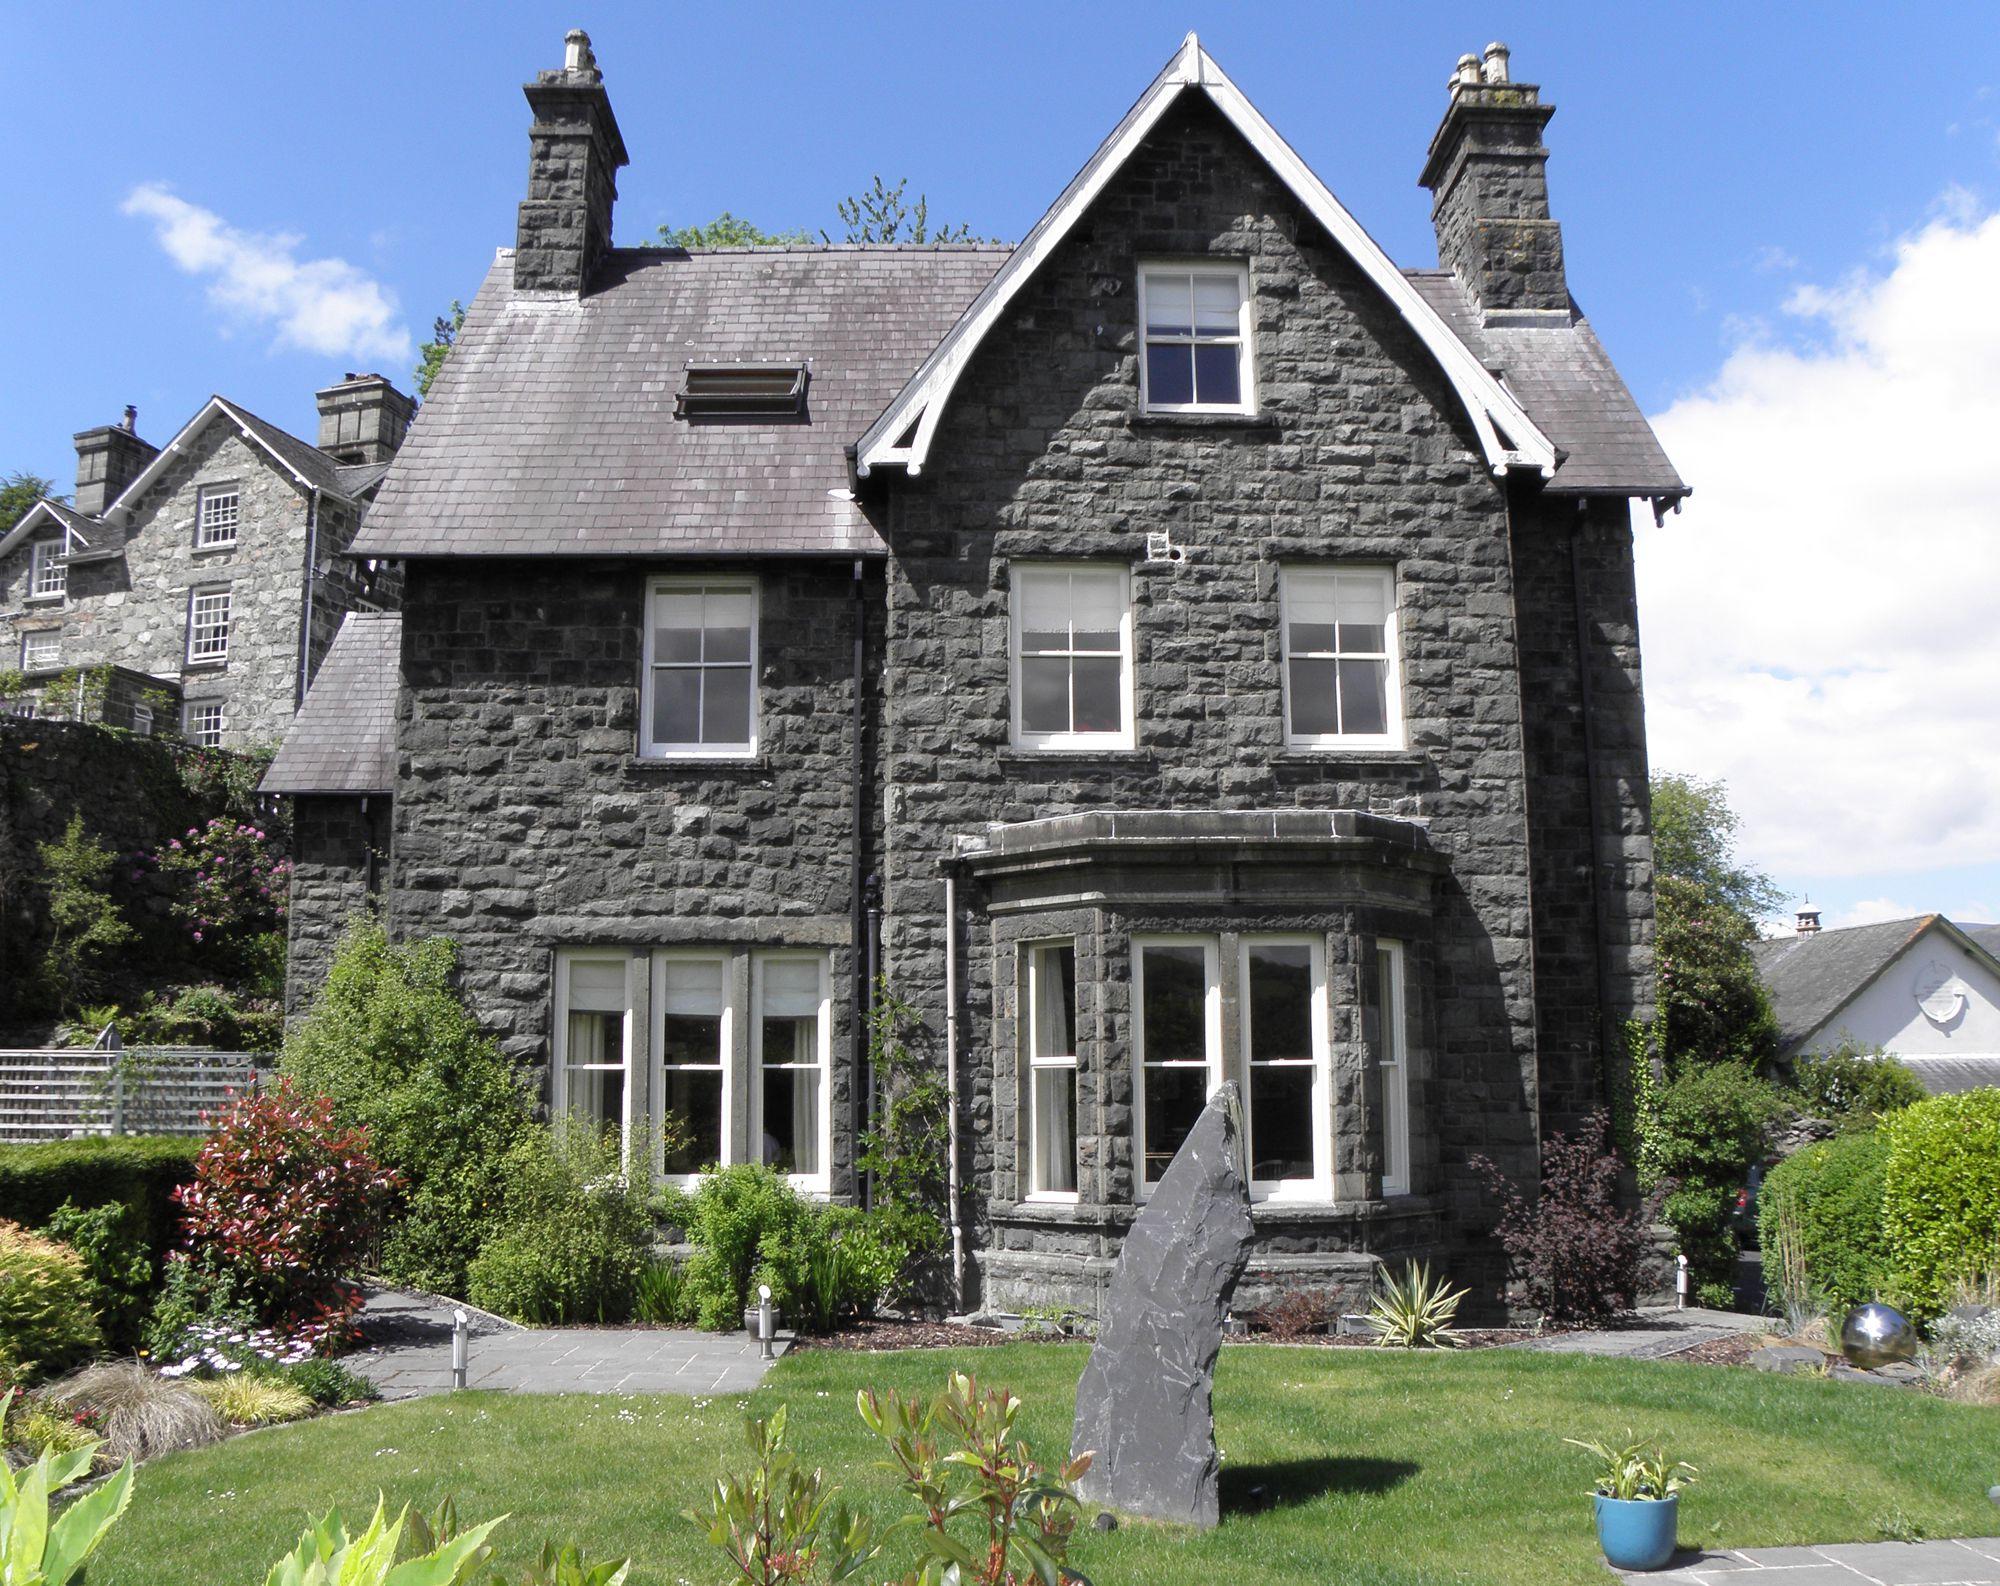 Hotels in Gwynedd holidays at Cool Places